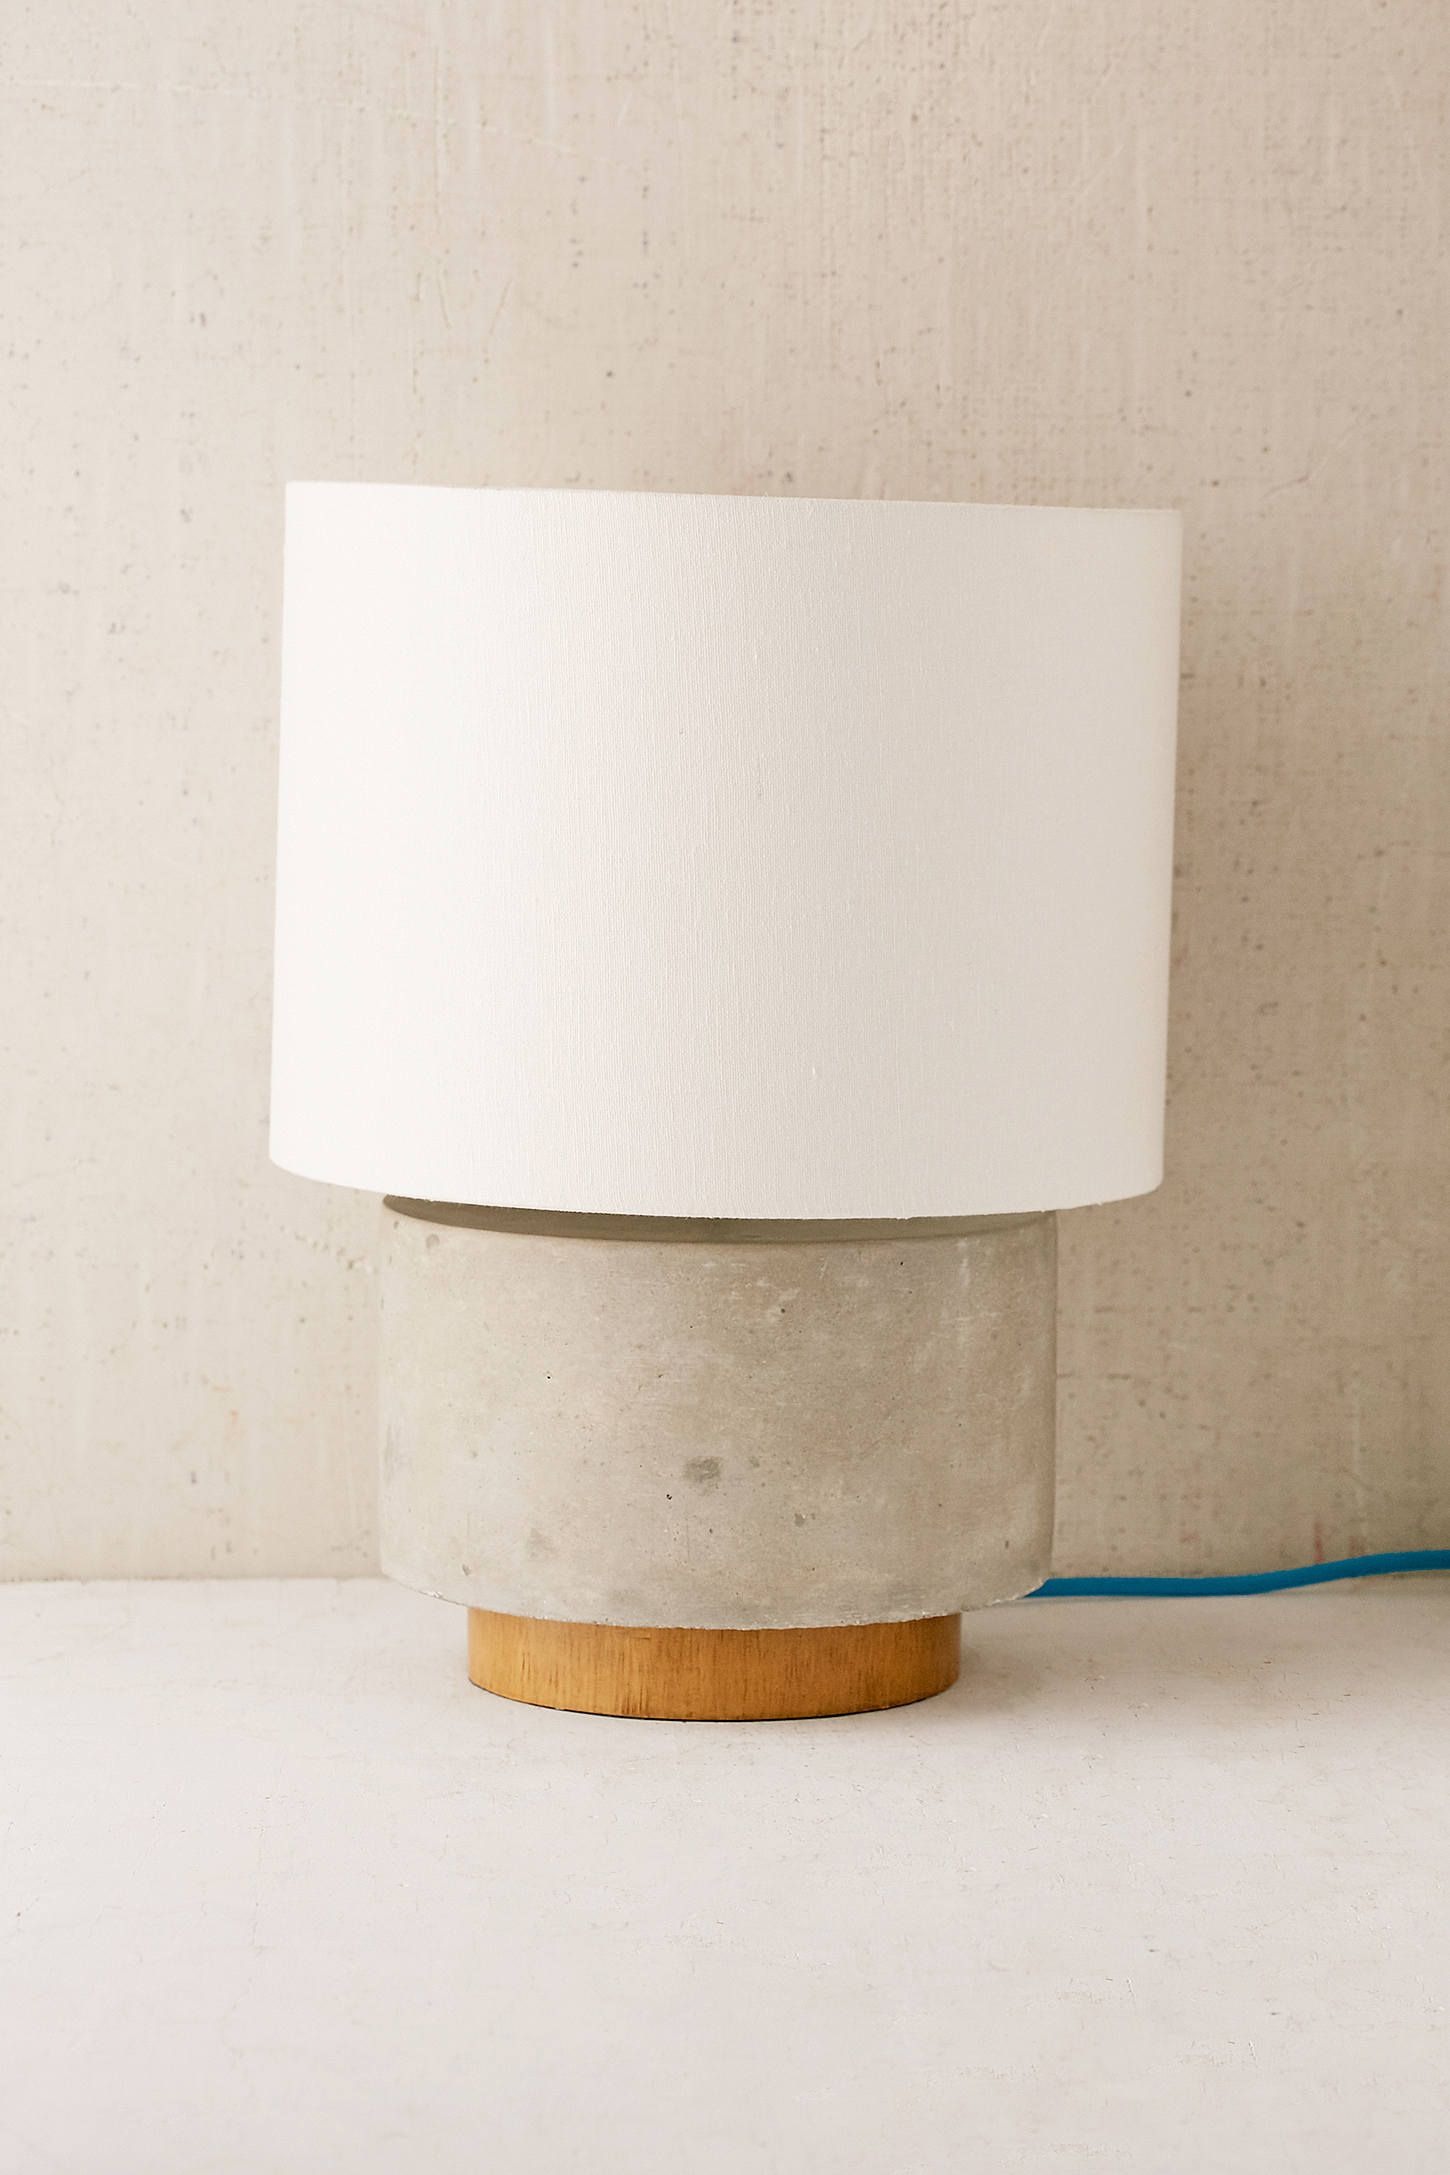 Lamps & Shades Desk Lamps Honesty Creative Simple Table Lamp Bedroom Study Light Desk Bedside Lamps E27 Table Lights Indoor Lighting Night Light